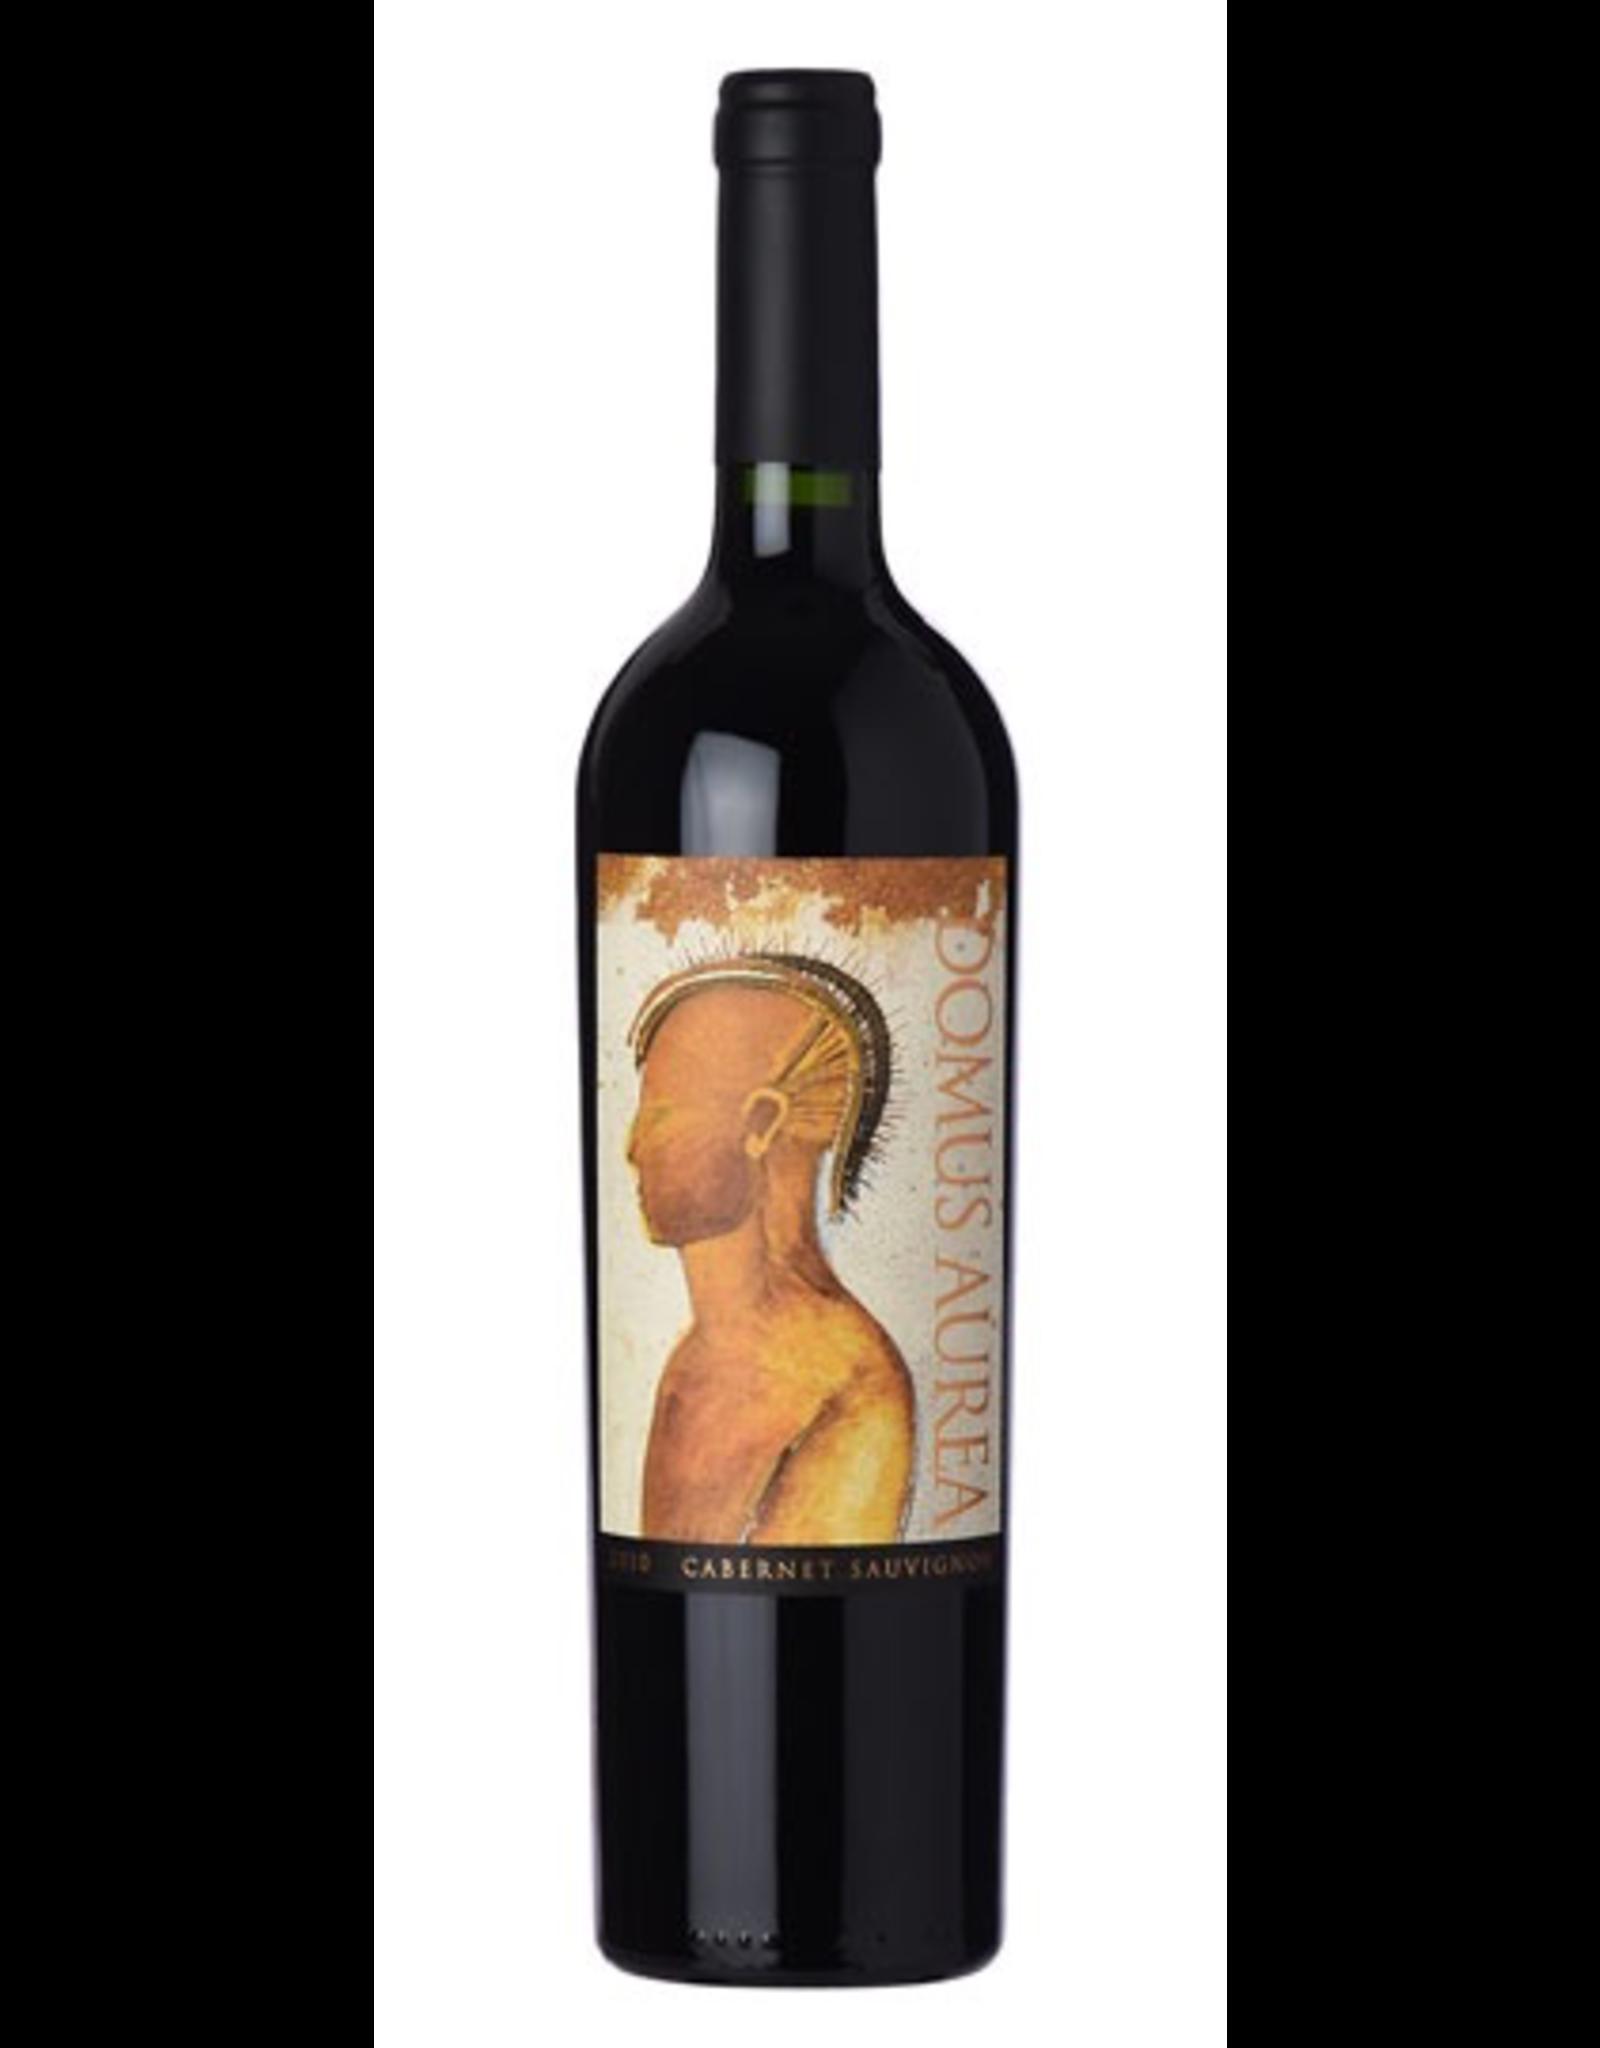 Red Wine 2010 Domus Aurea, Cabernet Sauvignon, Clos Quebrada de Macul Vineyard, Upper Maipo Valley, Chile, 14% Alc, RP96 CT90.3